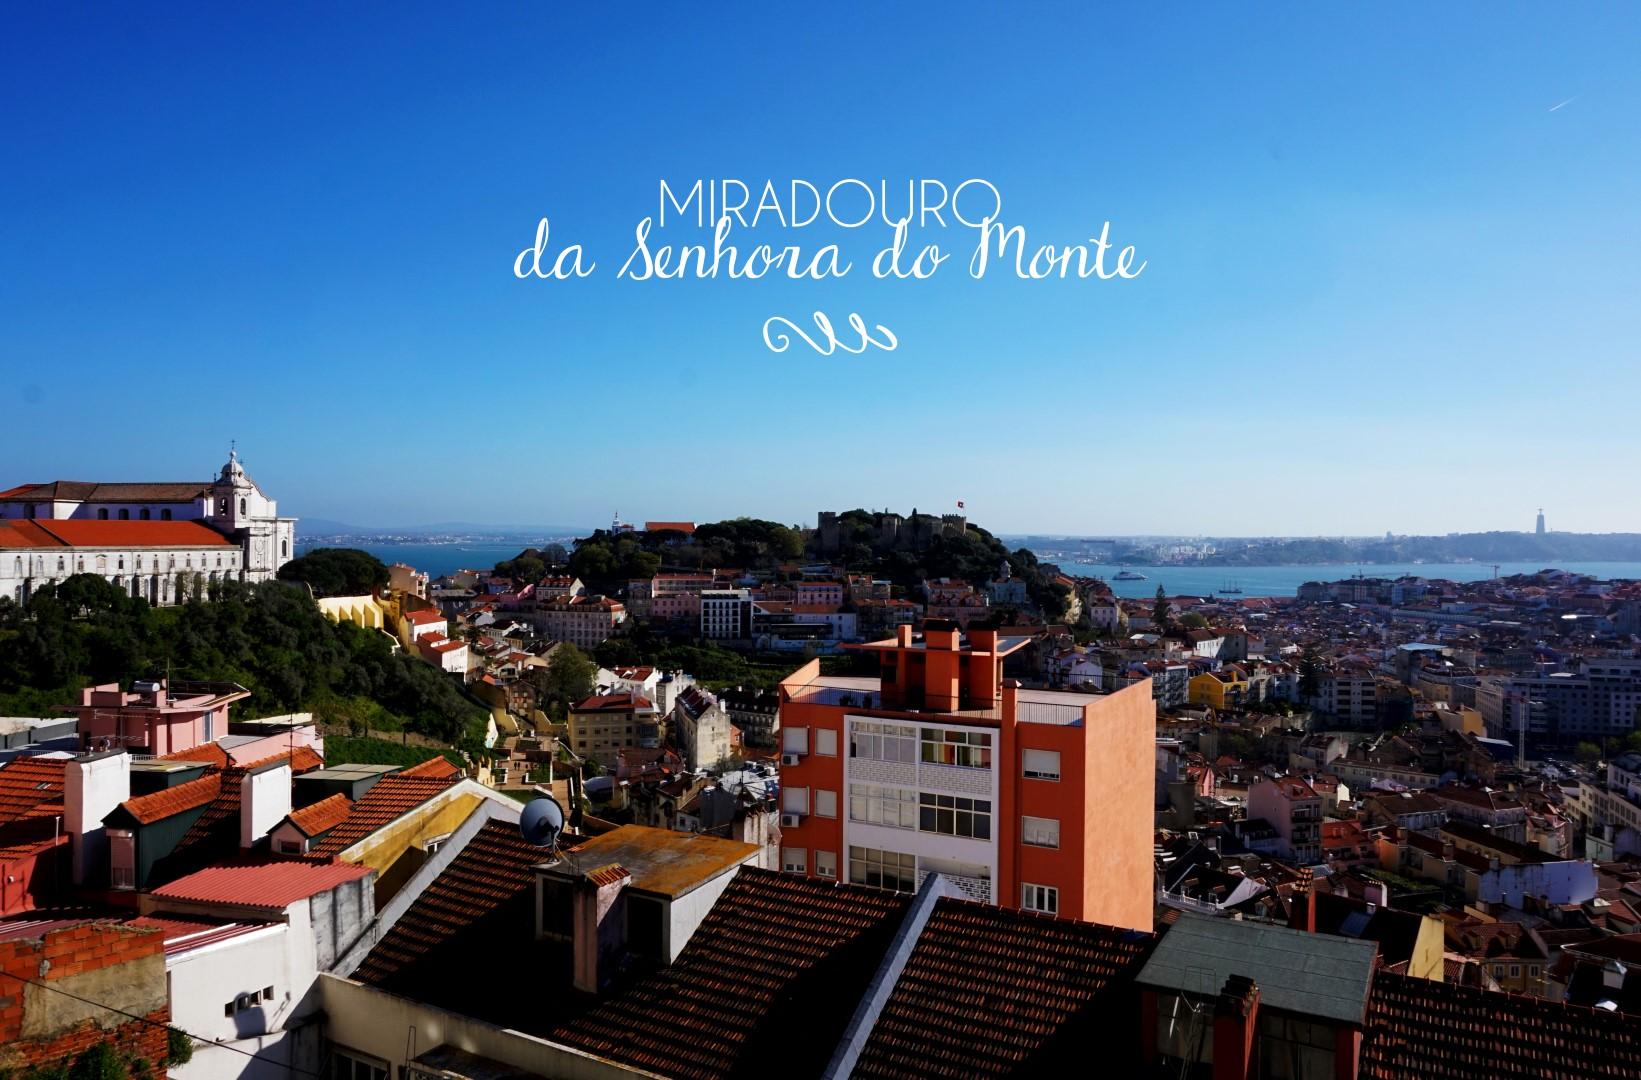 Lisbonne - Miradouro de Senhora do Monte